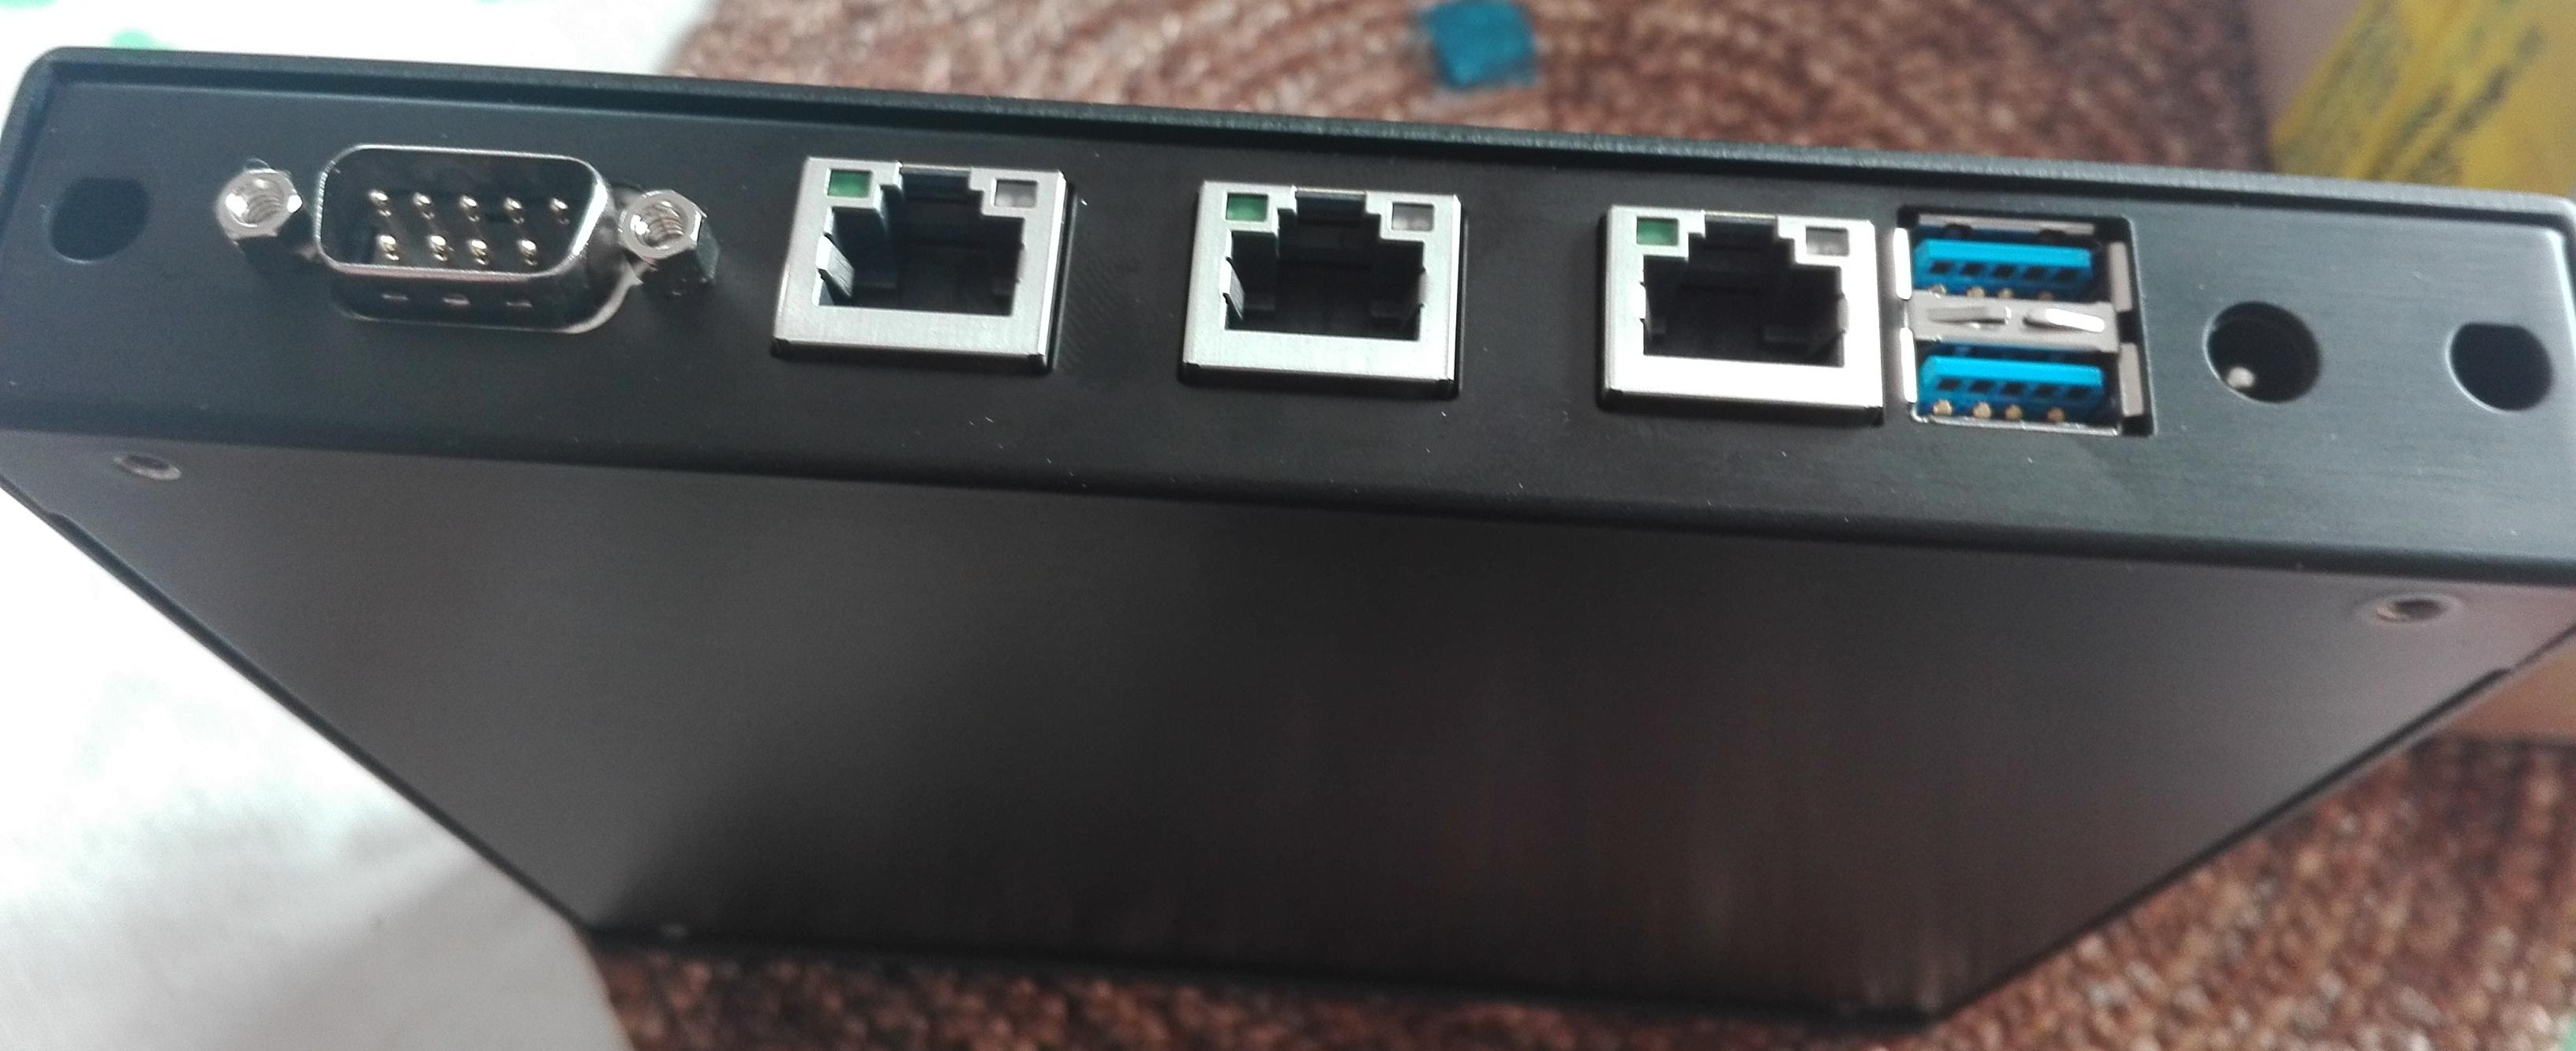 apu-pfsense-vpn-router-keri-4-2017